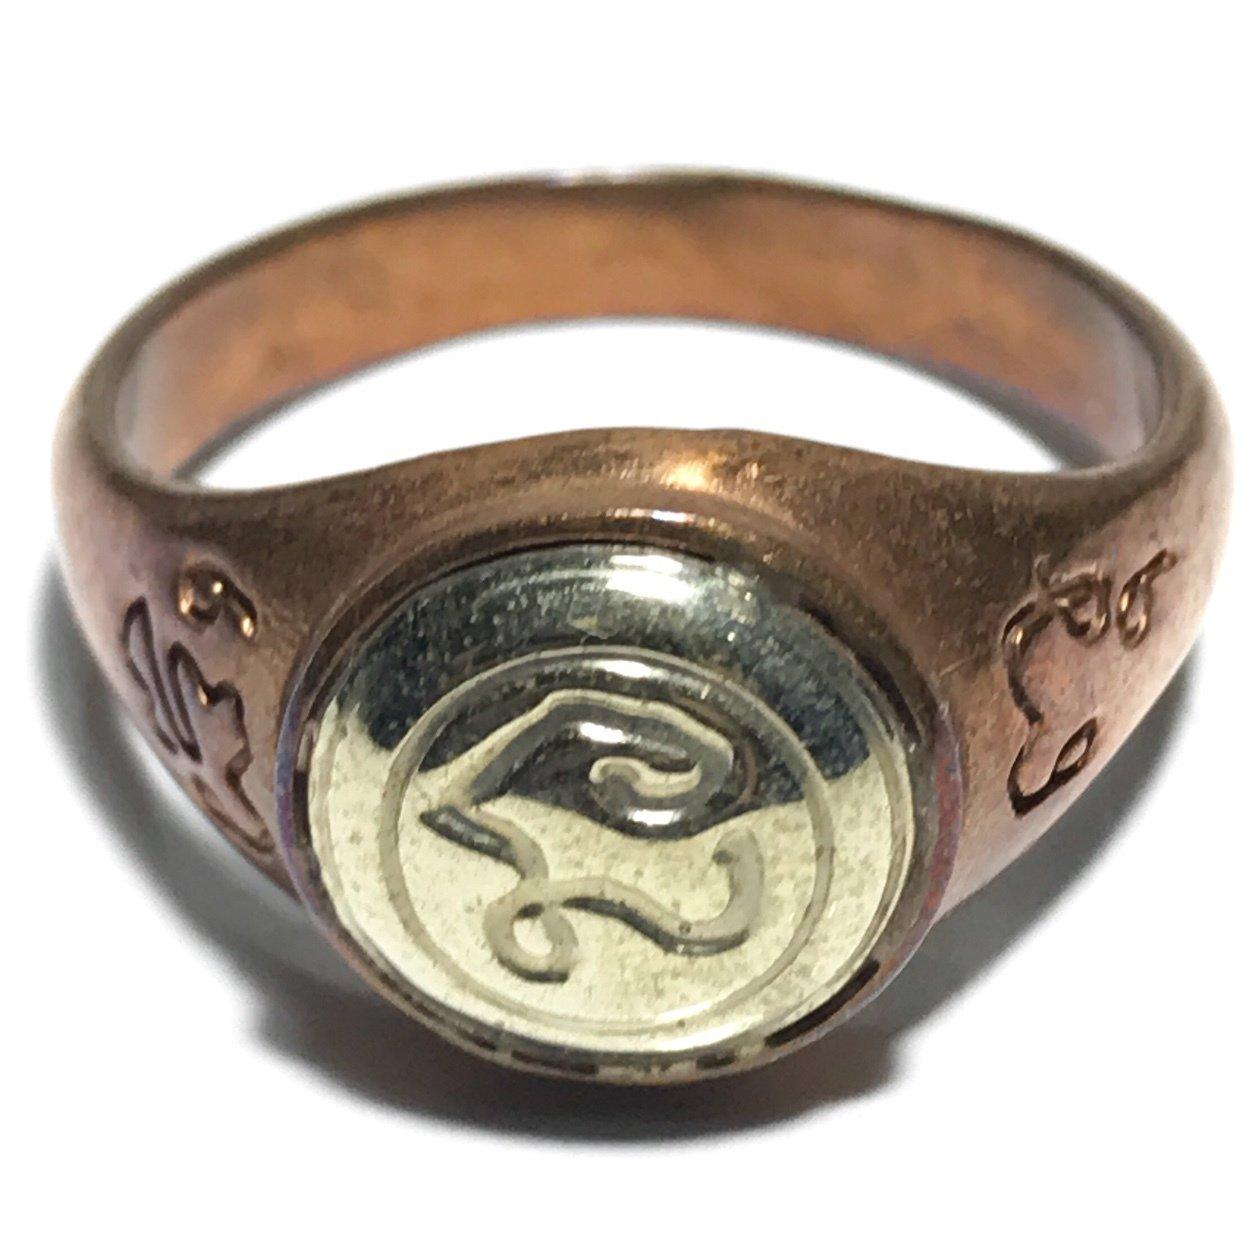 Hwaen Hua Na Bad Dtalord Magic Ring With Sacred Na Spell Luang Por Phaew Wat Tanode Luang 03374